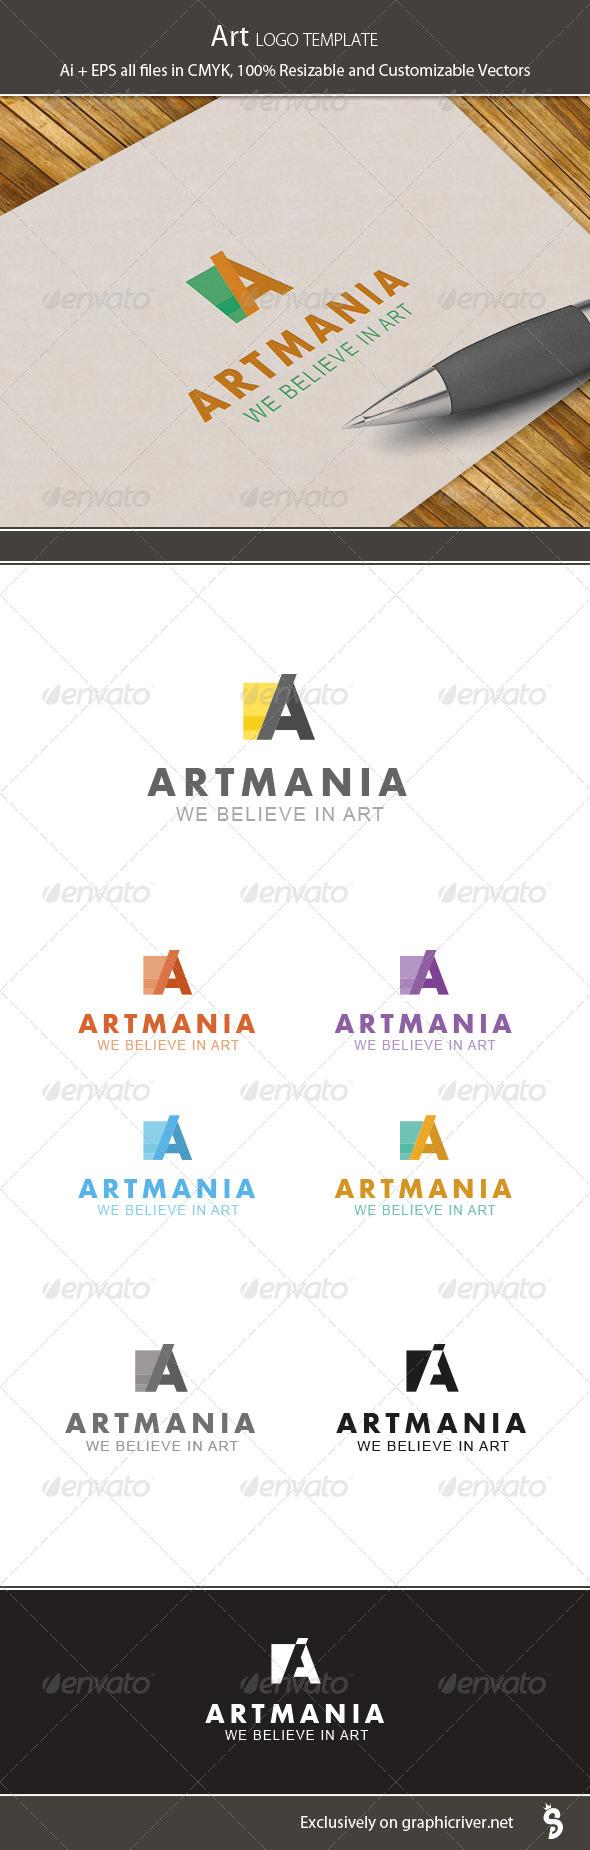 GraphicRiver Art Logo Template 6429476